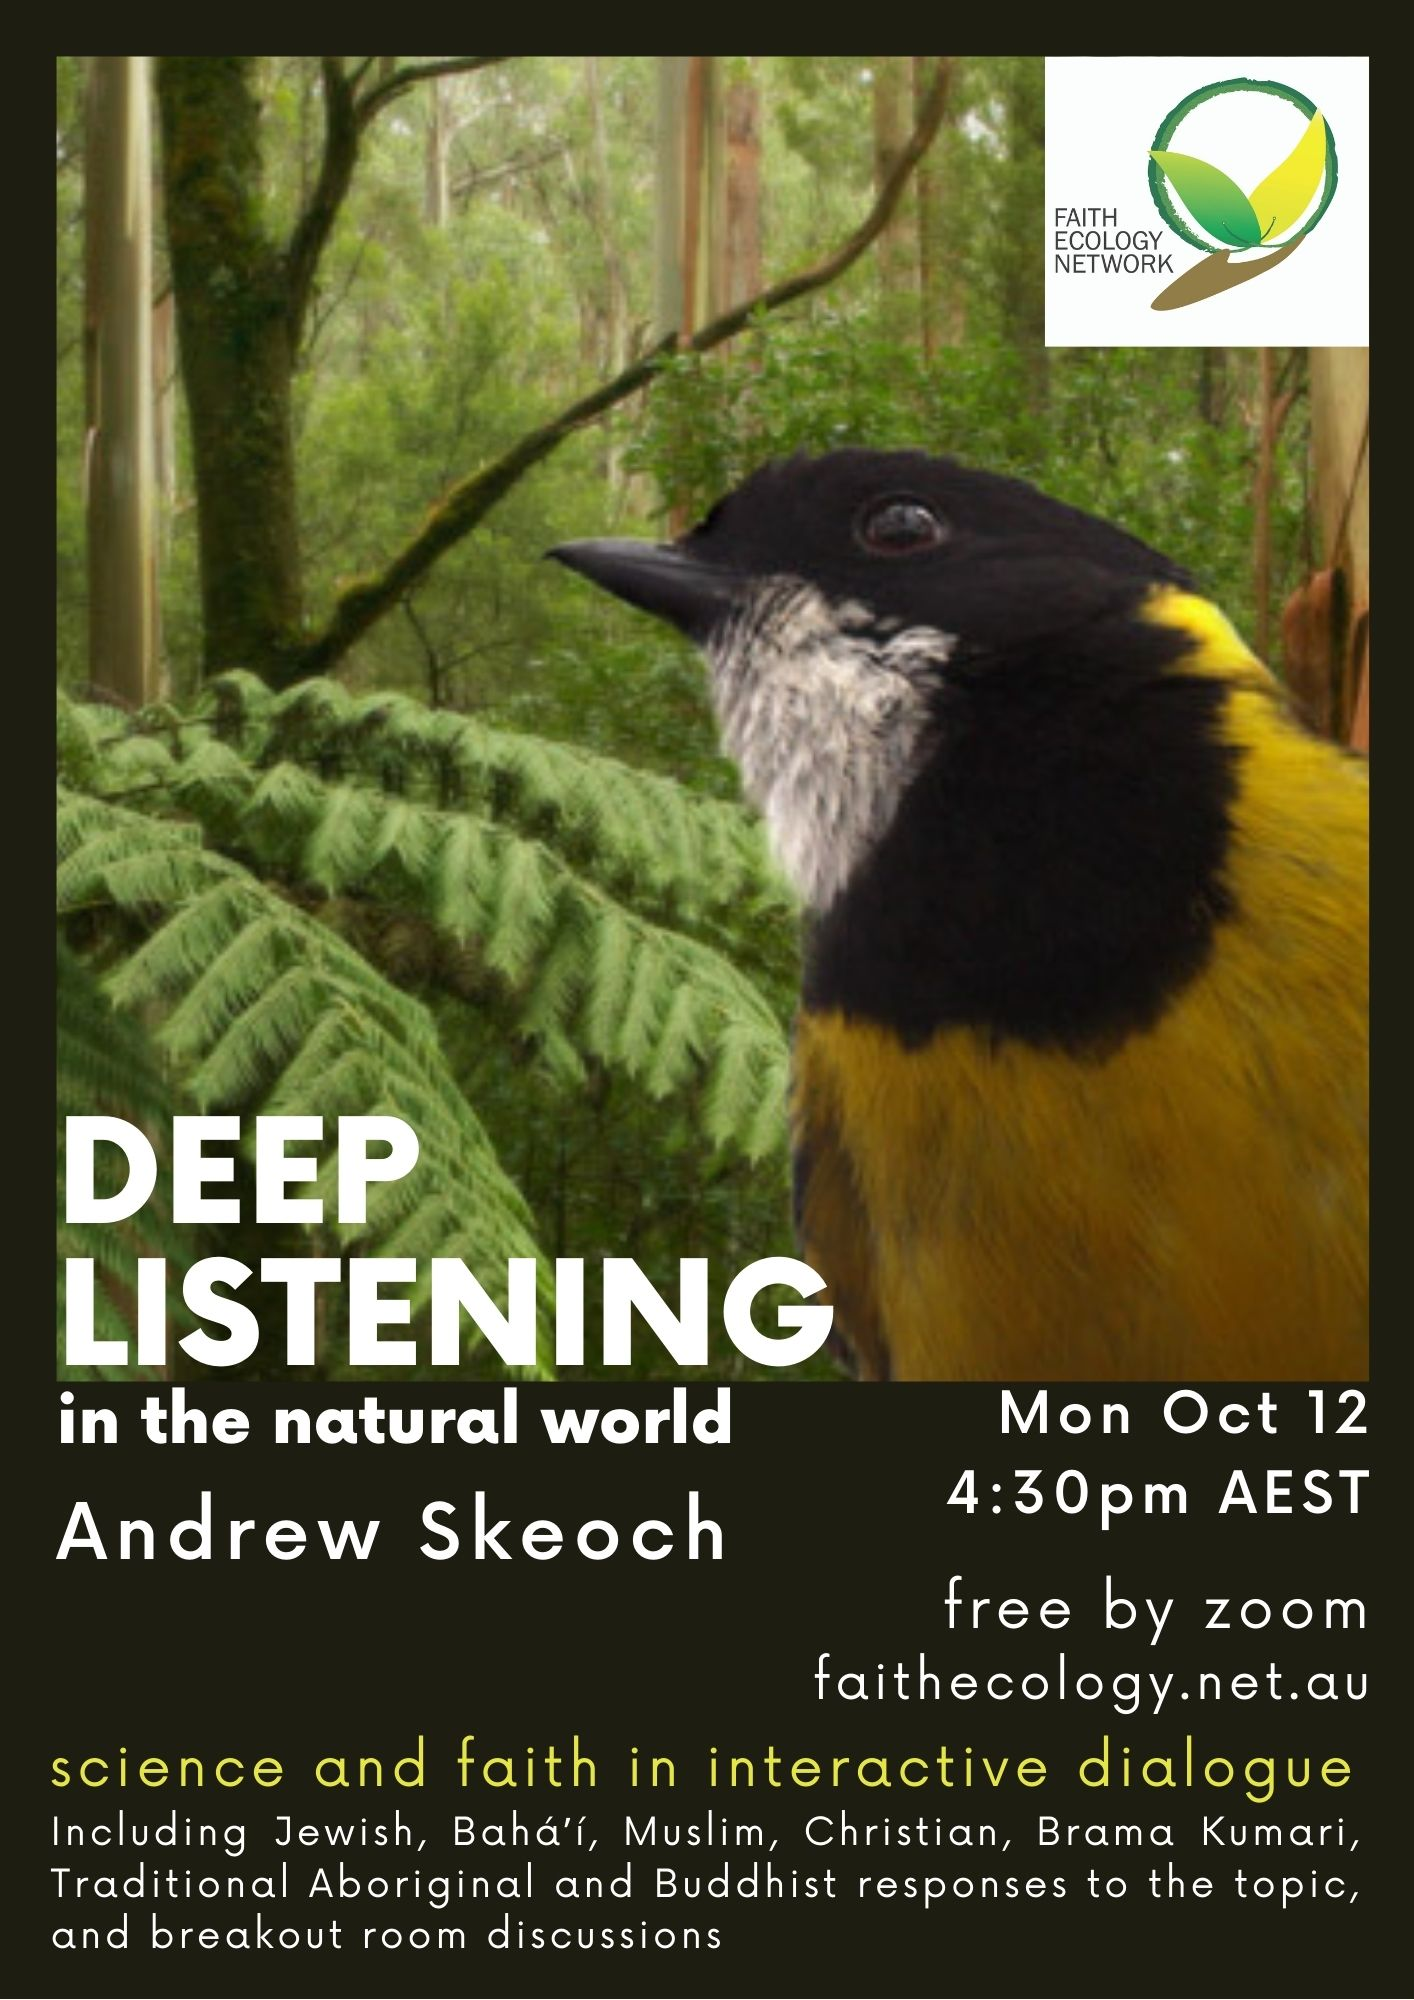 Draft poster for FEN Deep listening event